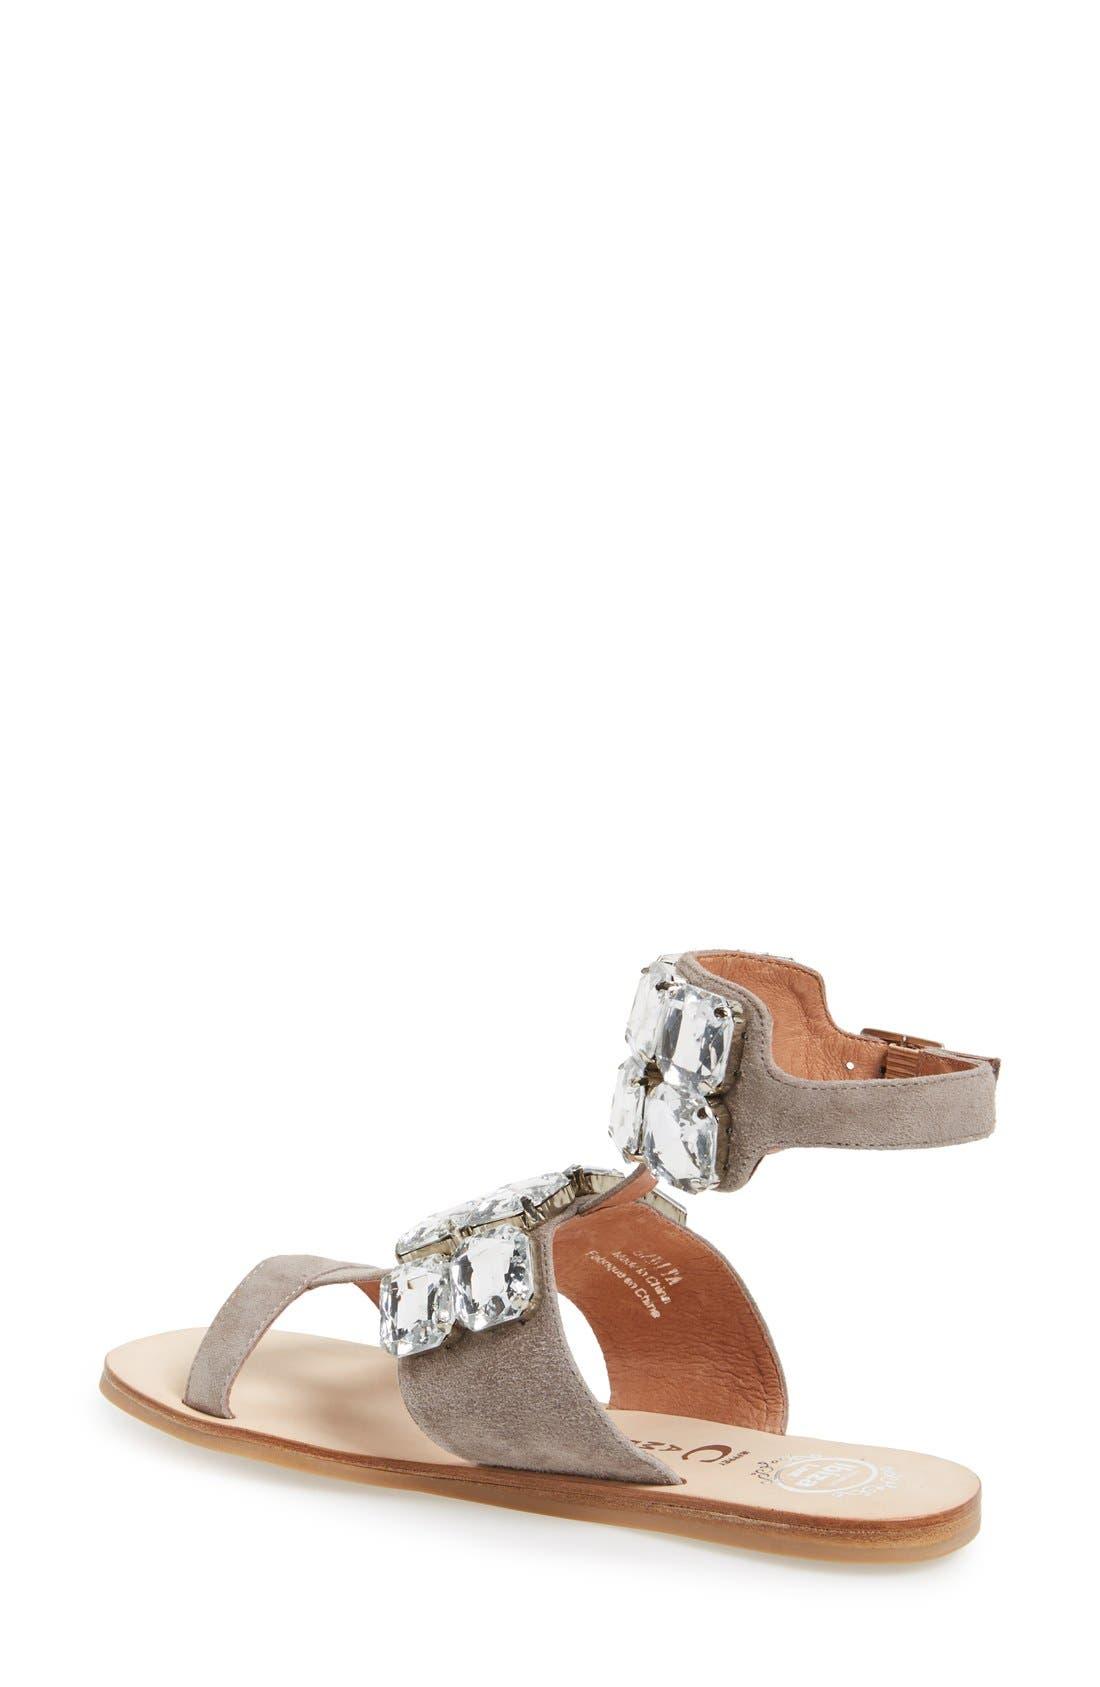 Alternate Image 2  - Jeffrey Campbell 'Sabita' Jeweled Suede Ankle Strap Sandal (Women)